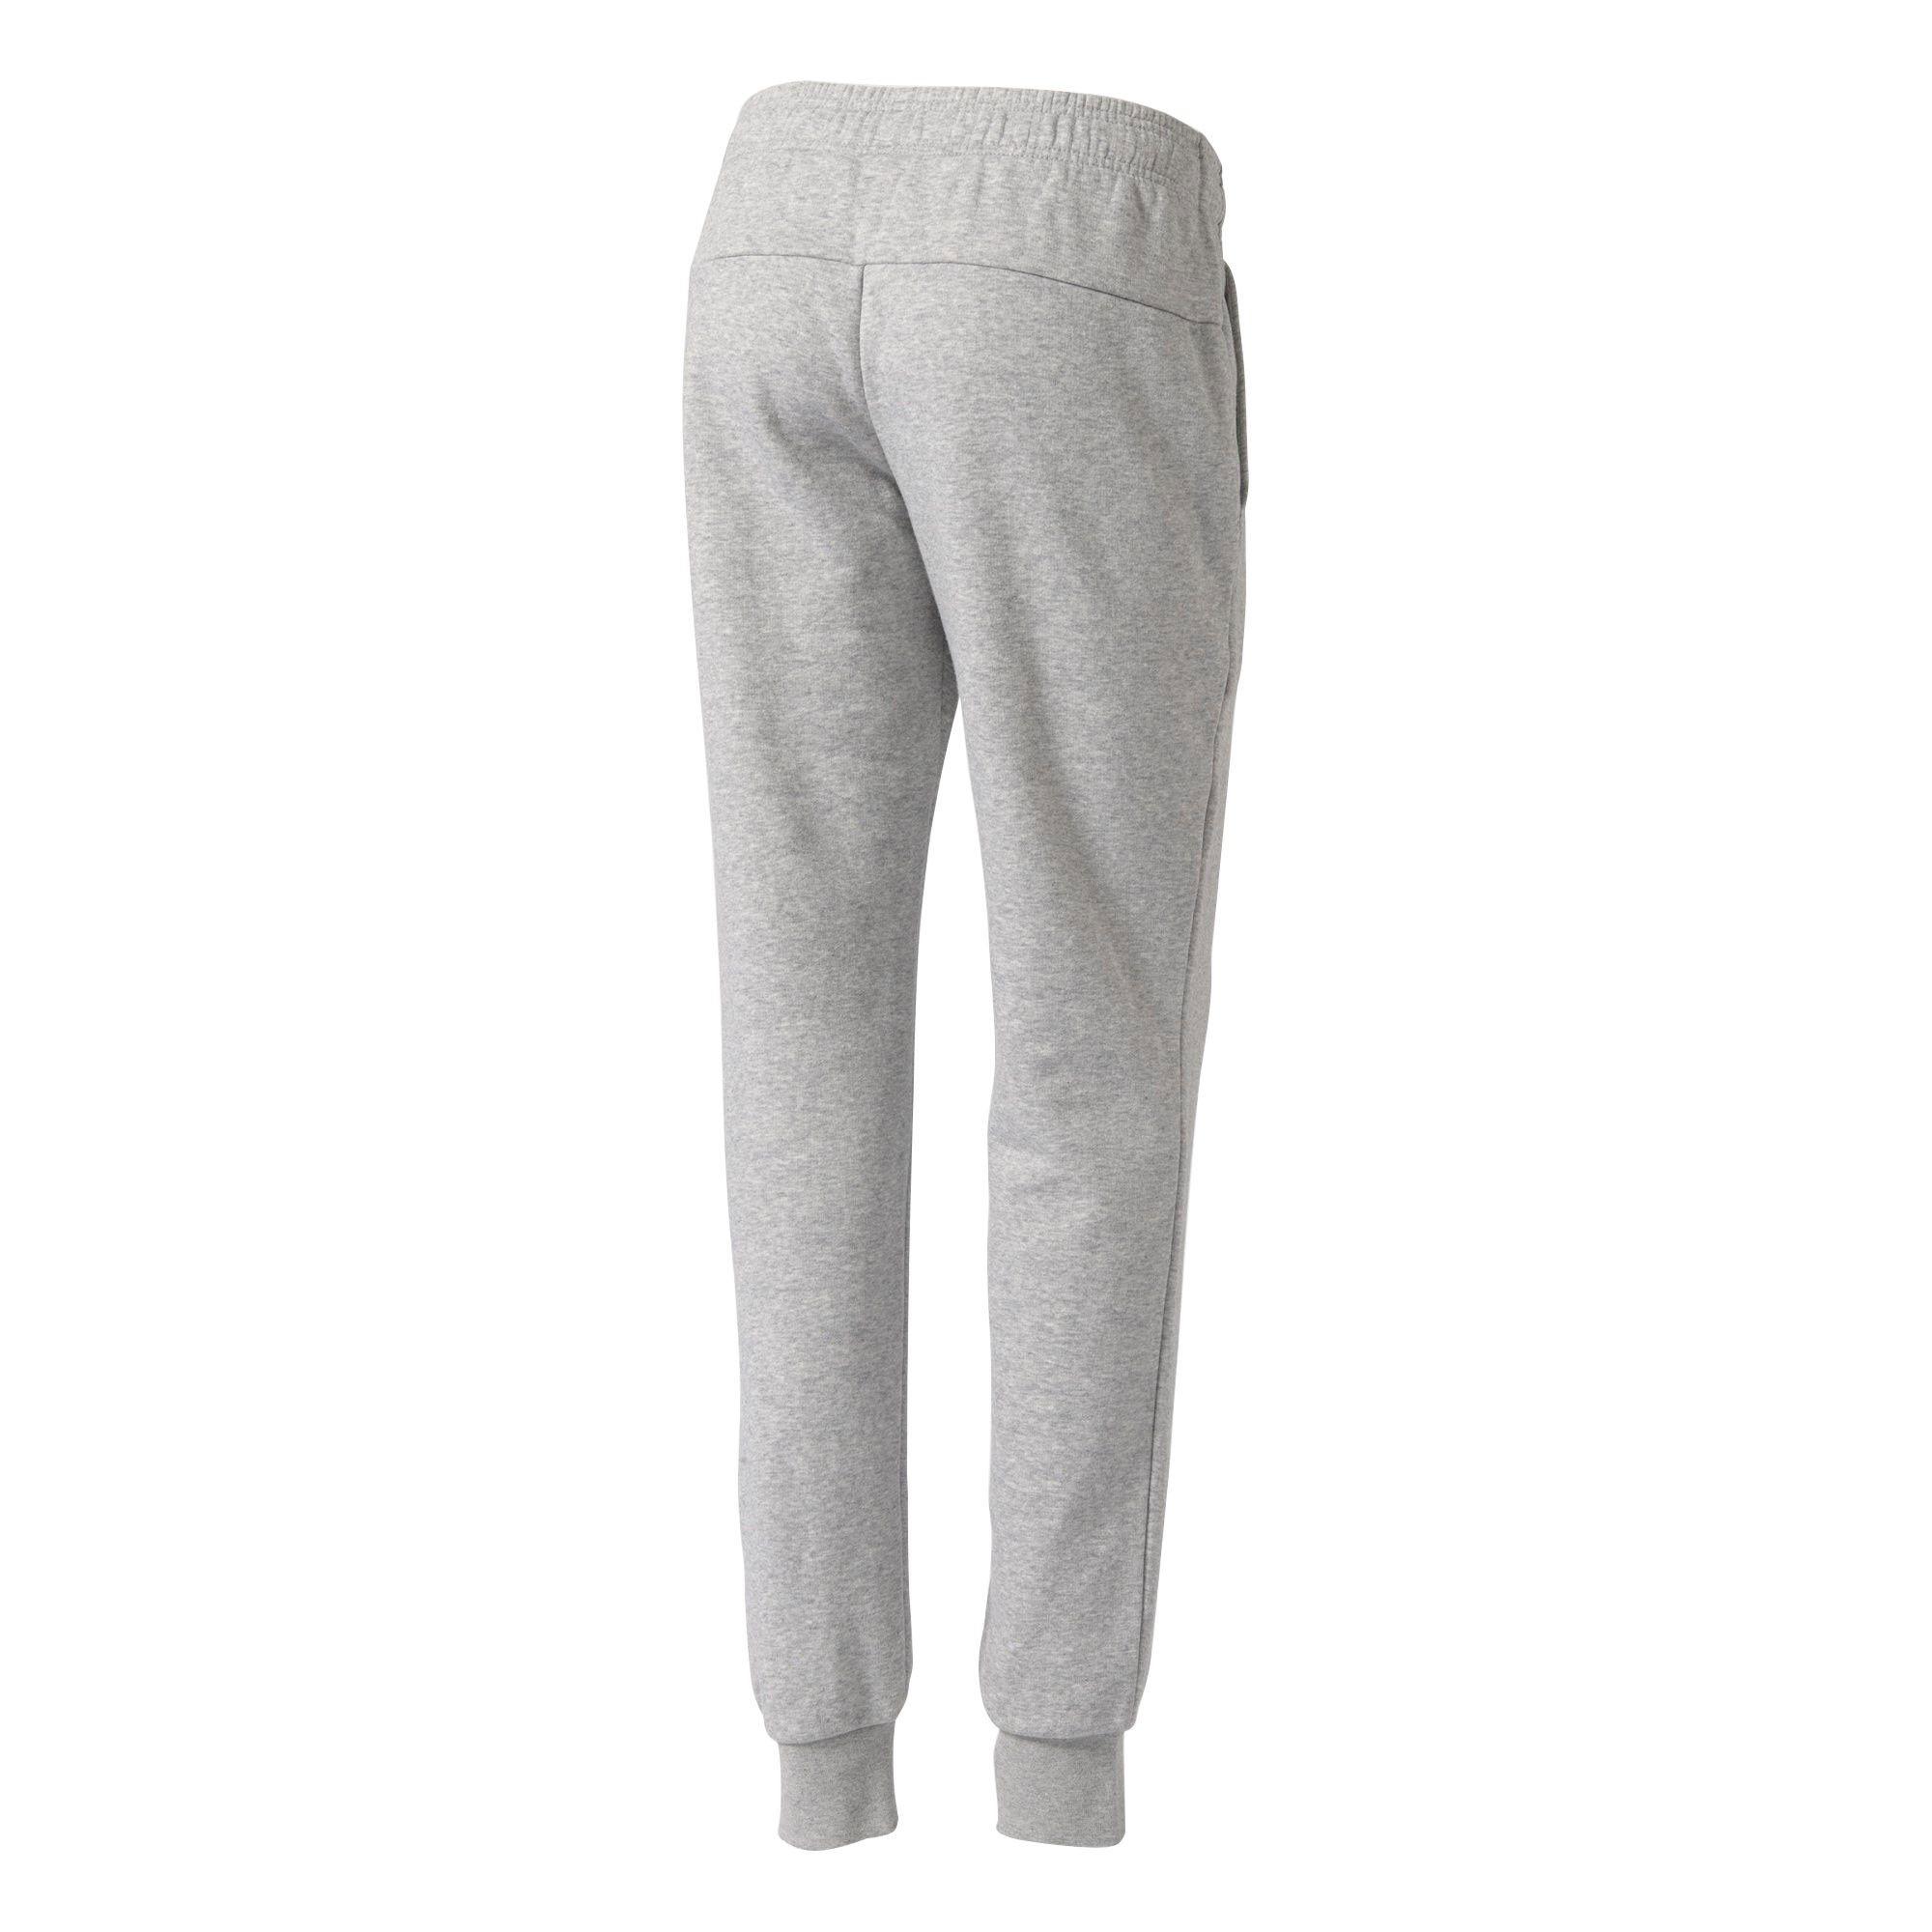 Calça Adidas Solid Essentials Feminina